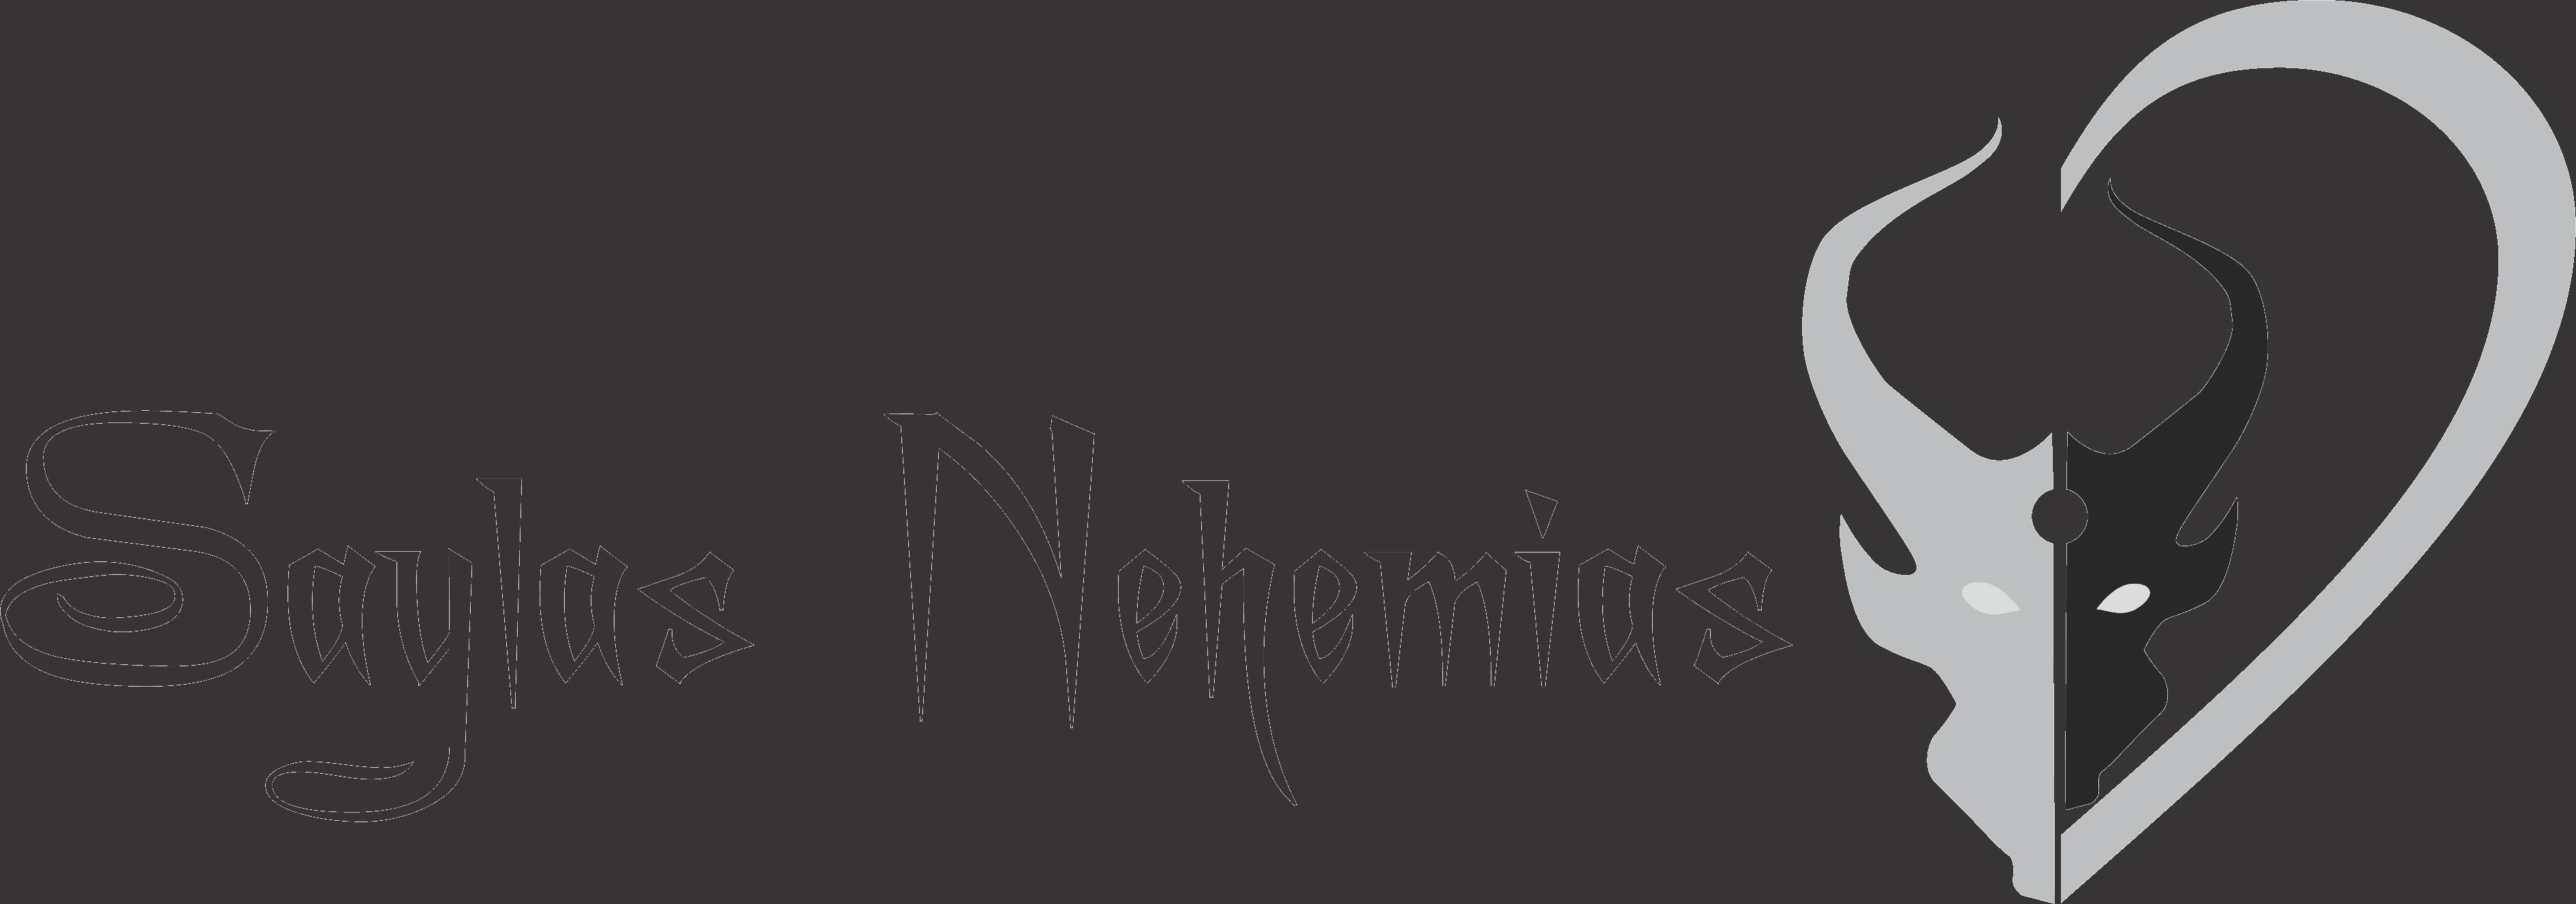 logo SAYLAS NEHEMIAS